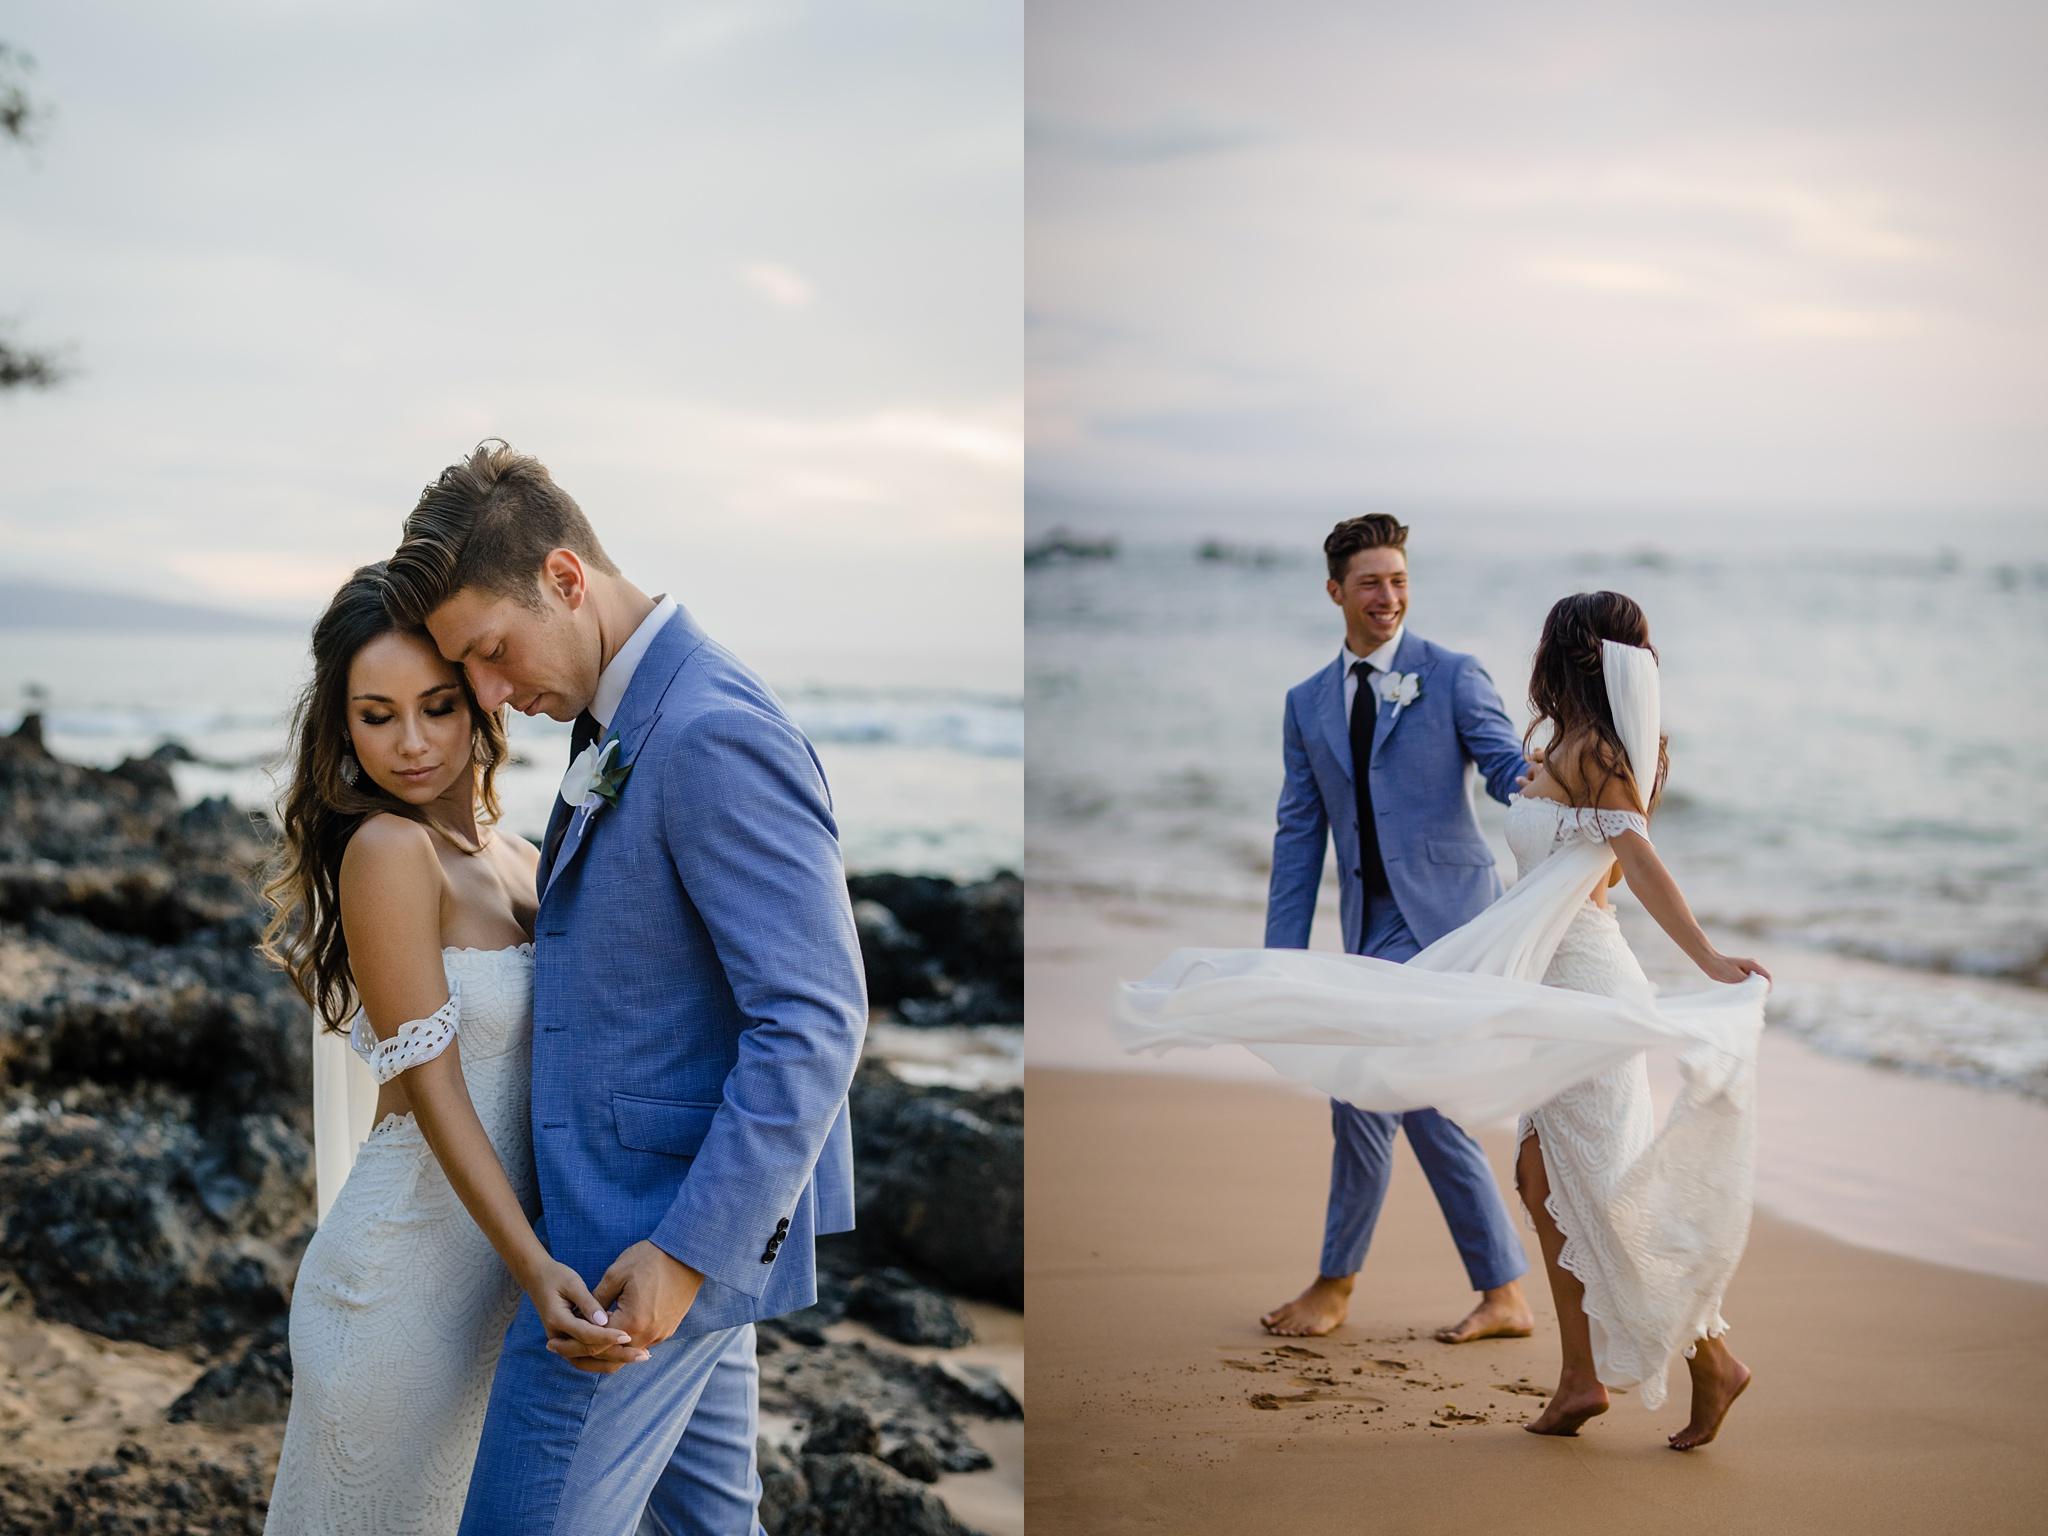 bride and groom photos in hawaii beach